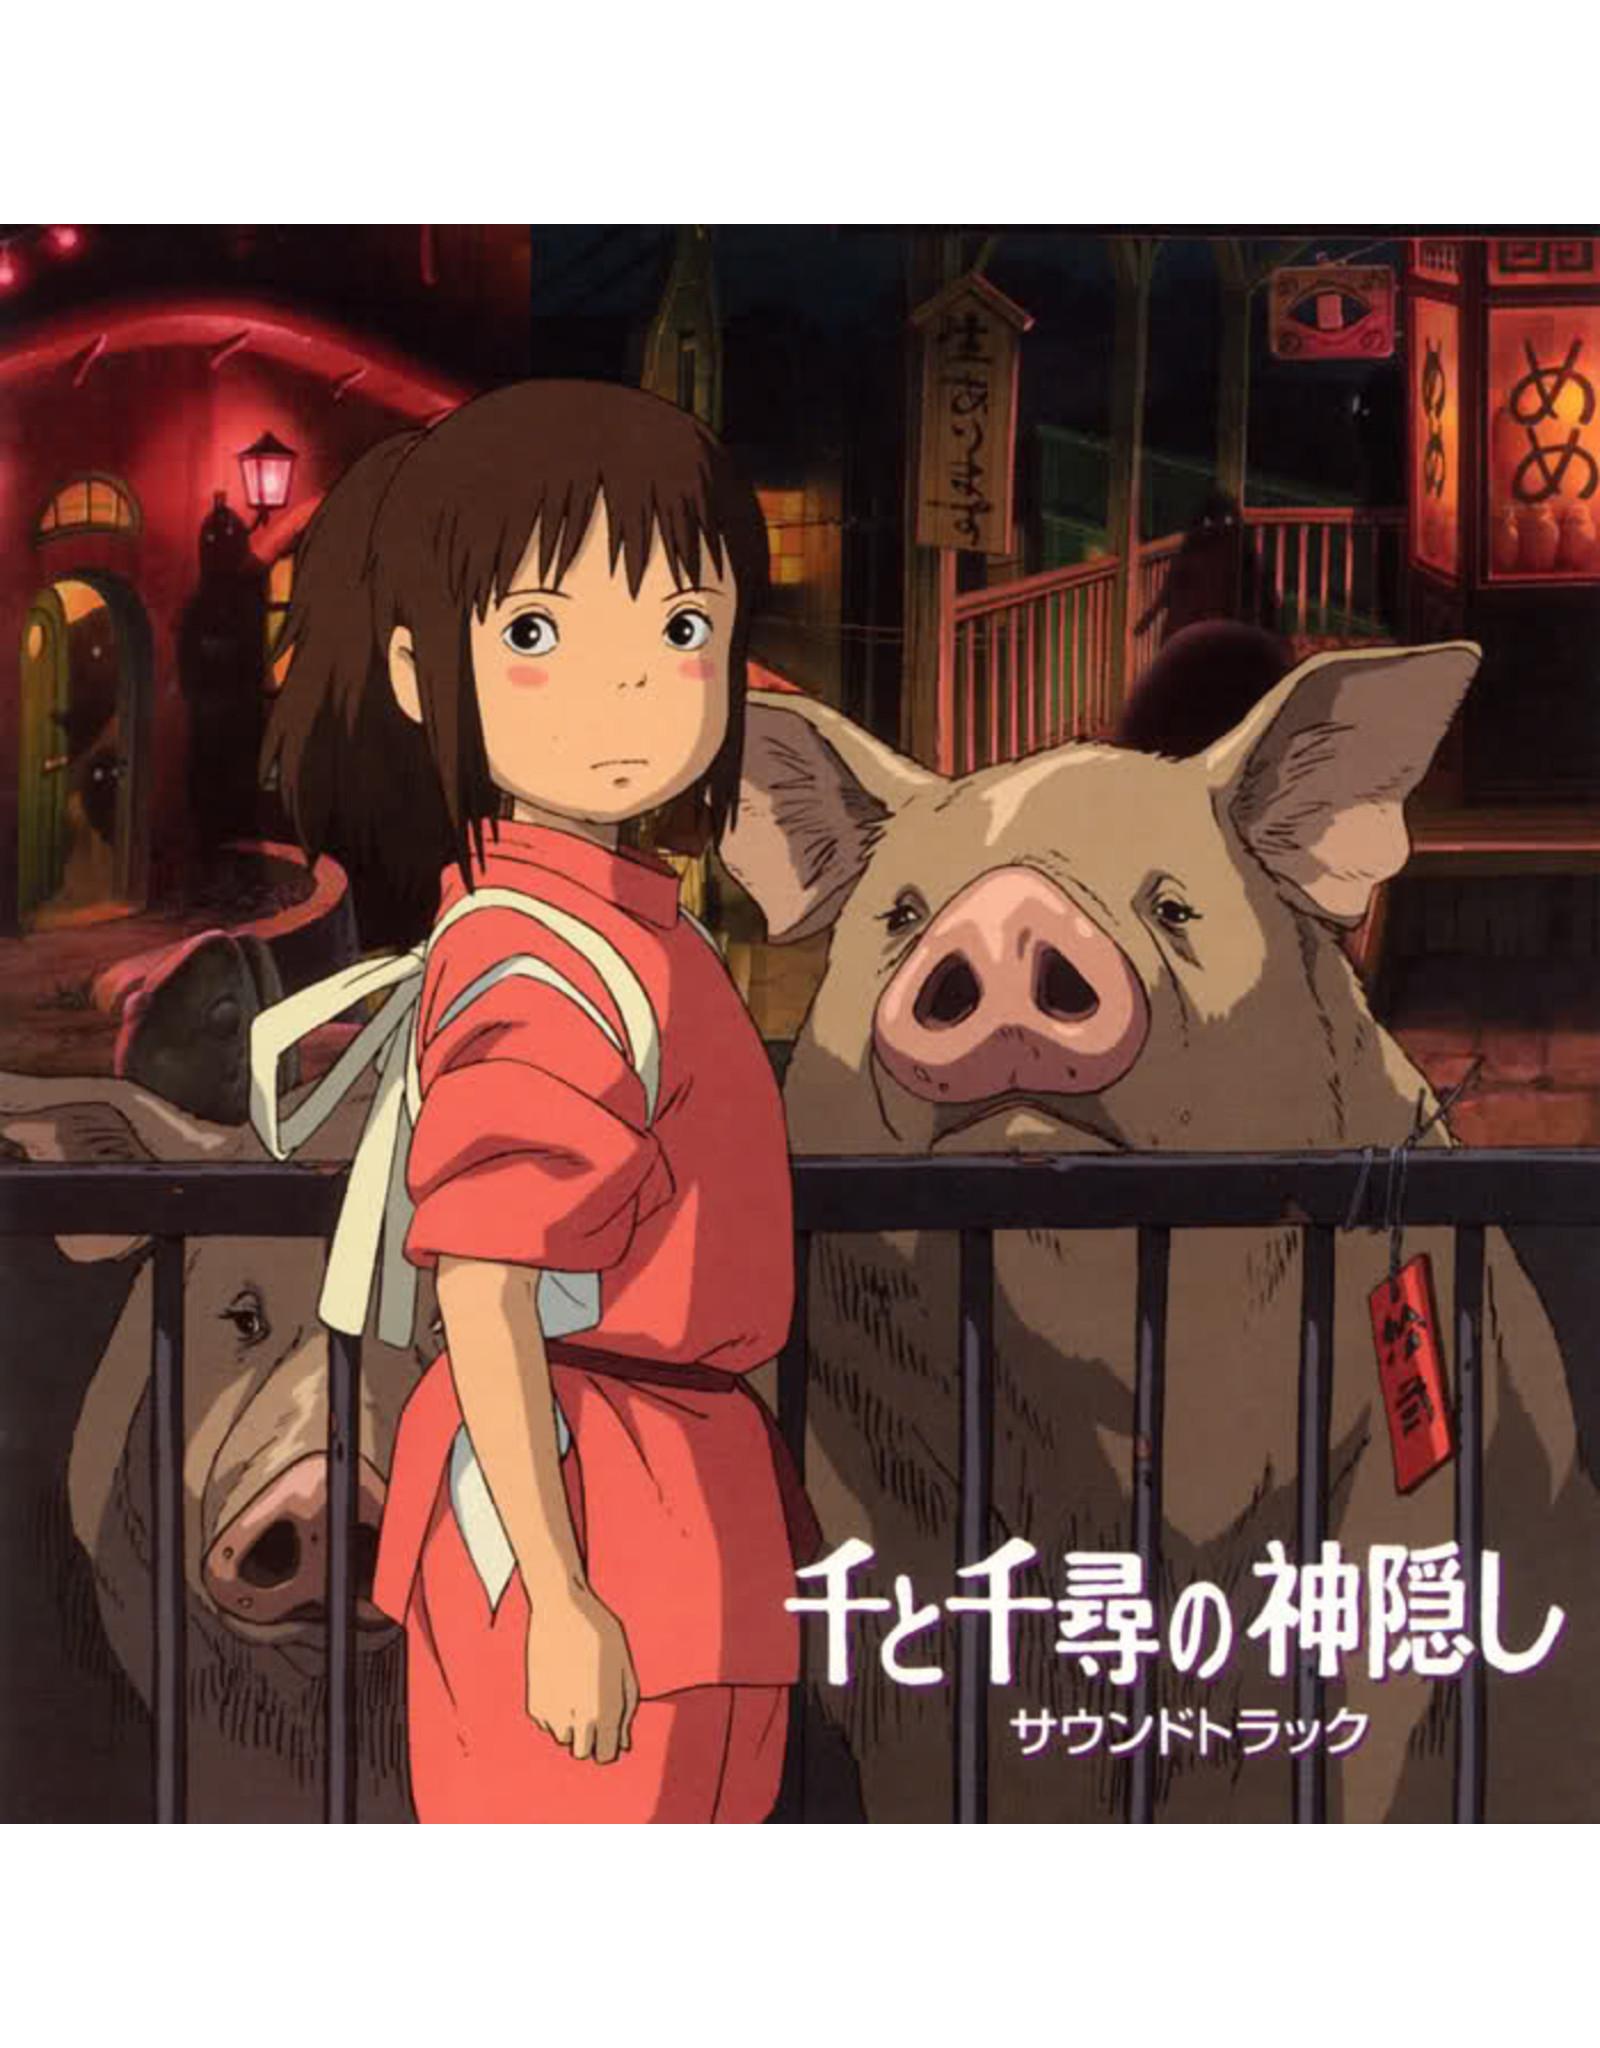 TOKUMA [CD]SENTOCHIHIRO NO KAMIKAKUSHI [SUPERPICTURELABELFOR1STPRESSING]  -STUDIO GHIBLI-